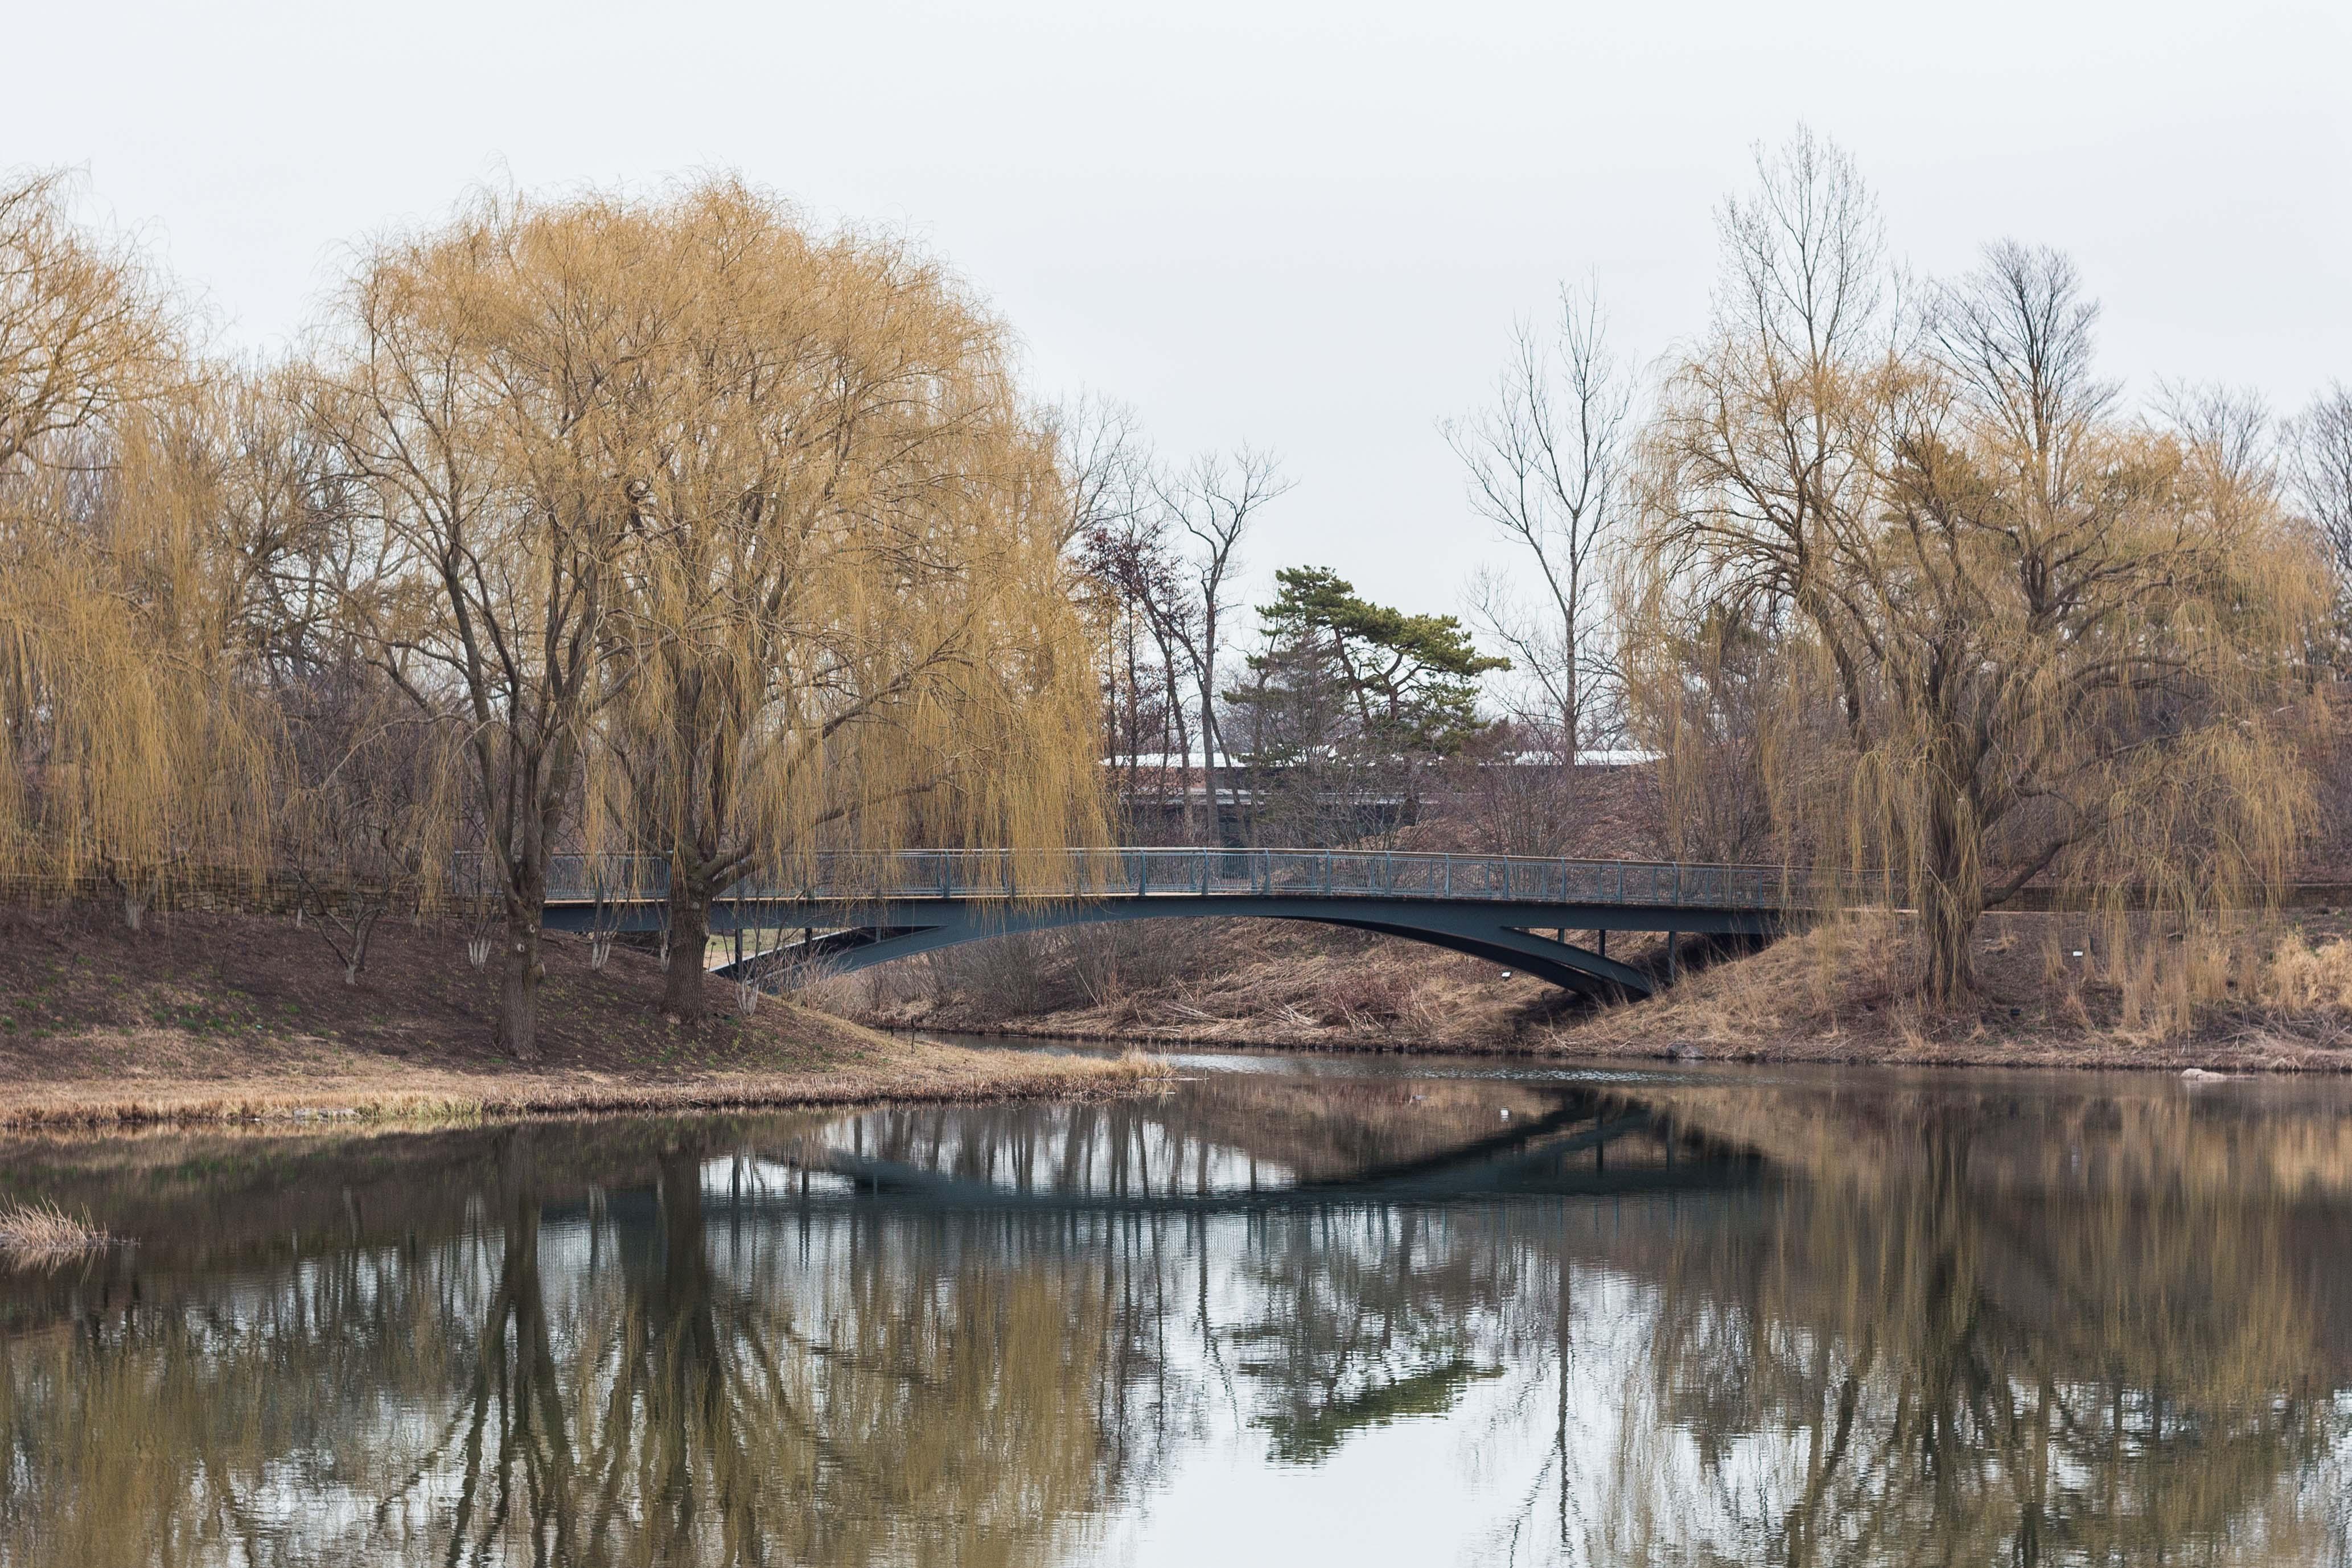 Chicago Botanic Gardens Lake Reflection   https://www.roseclearfield.com